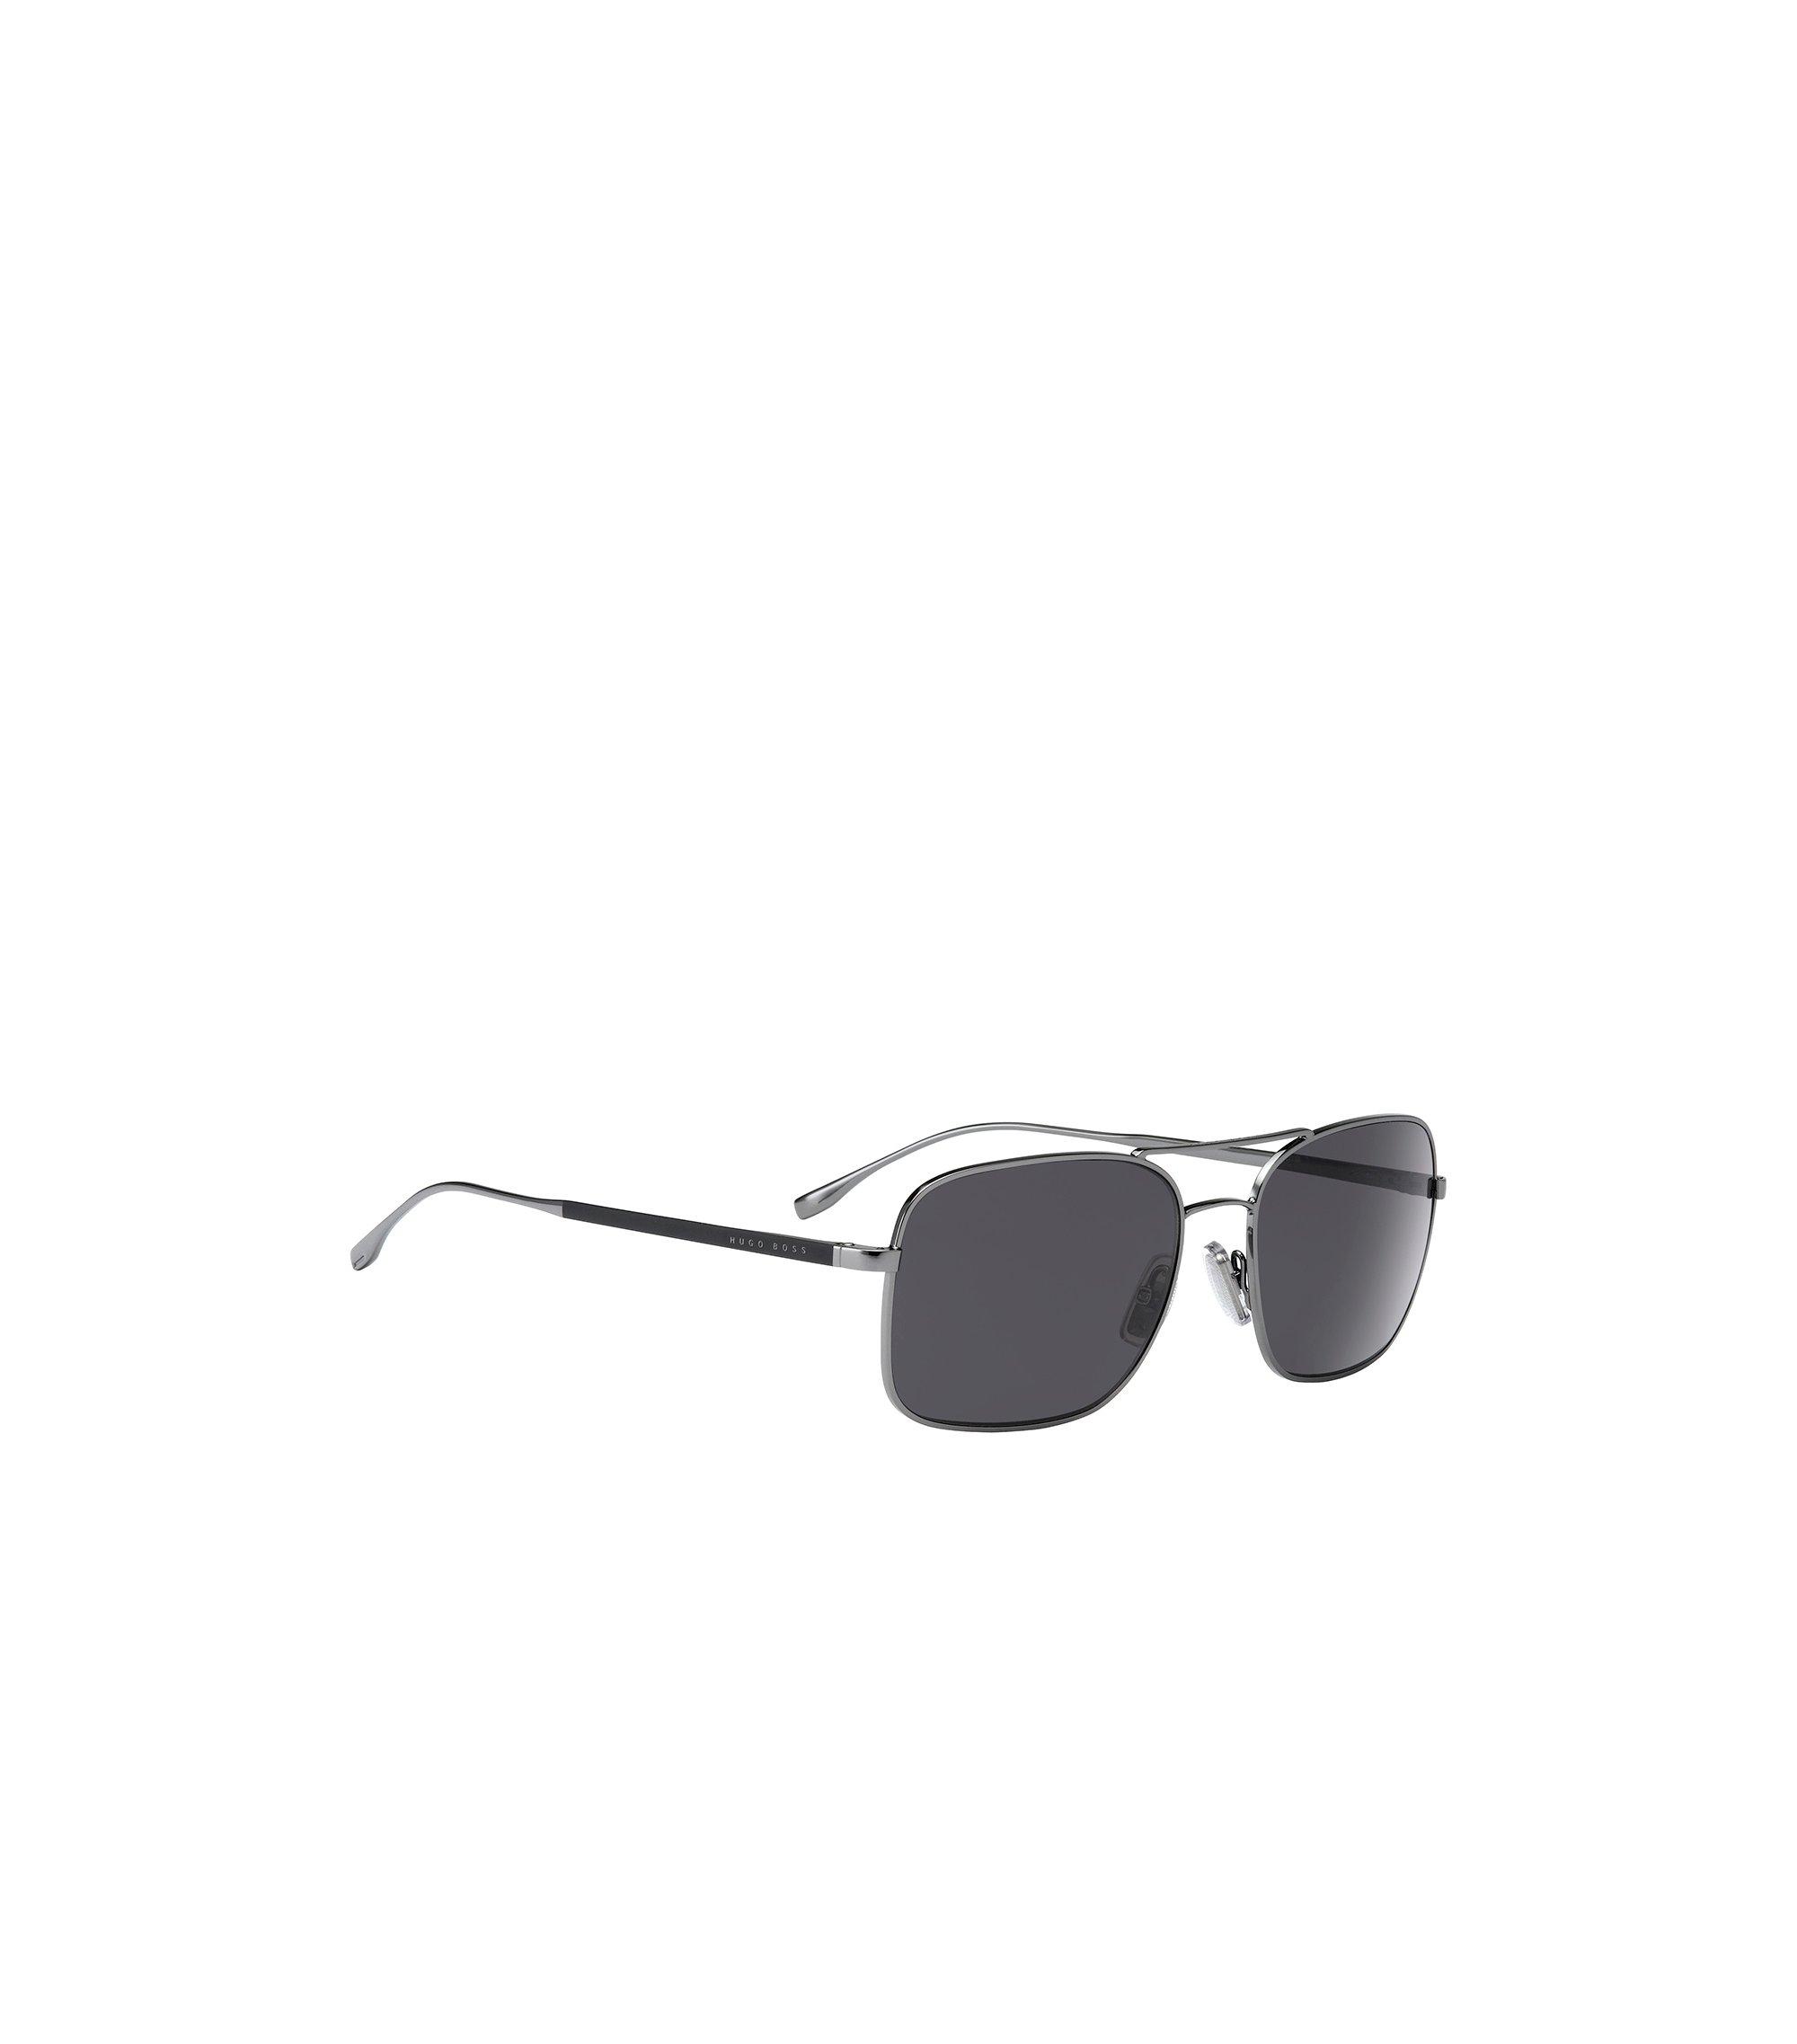 Hoekige zonnebril met smal montuur van metaal: 'BOSS 0781/S', Assorted-Pre-Pack